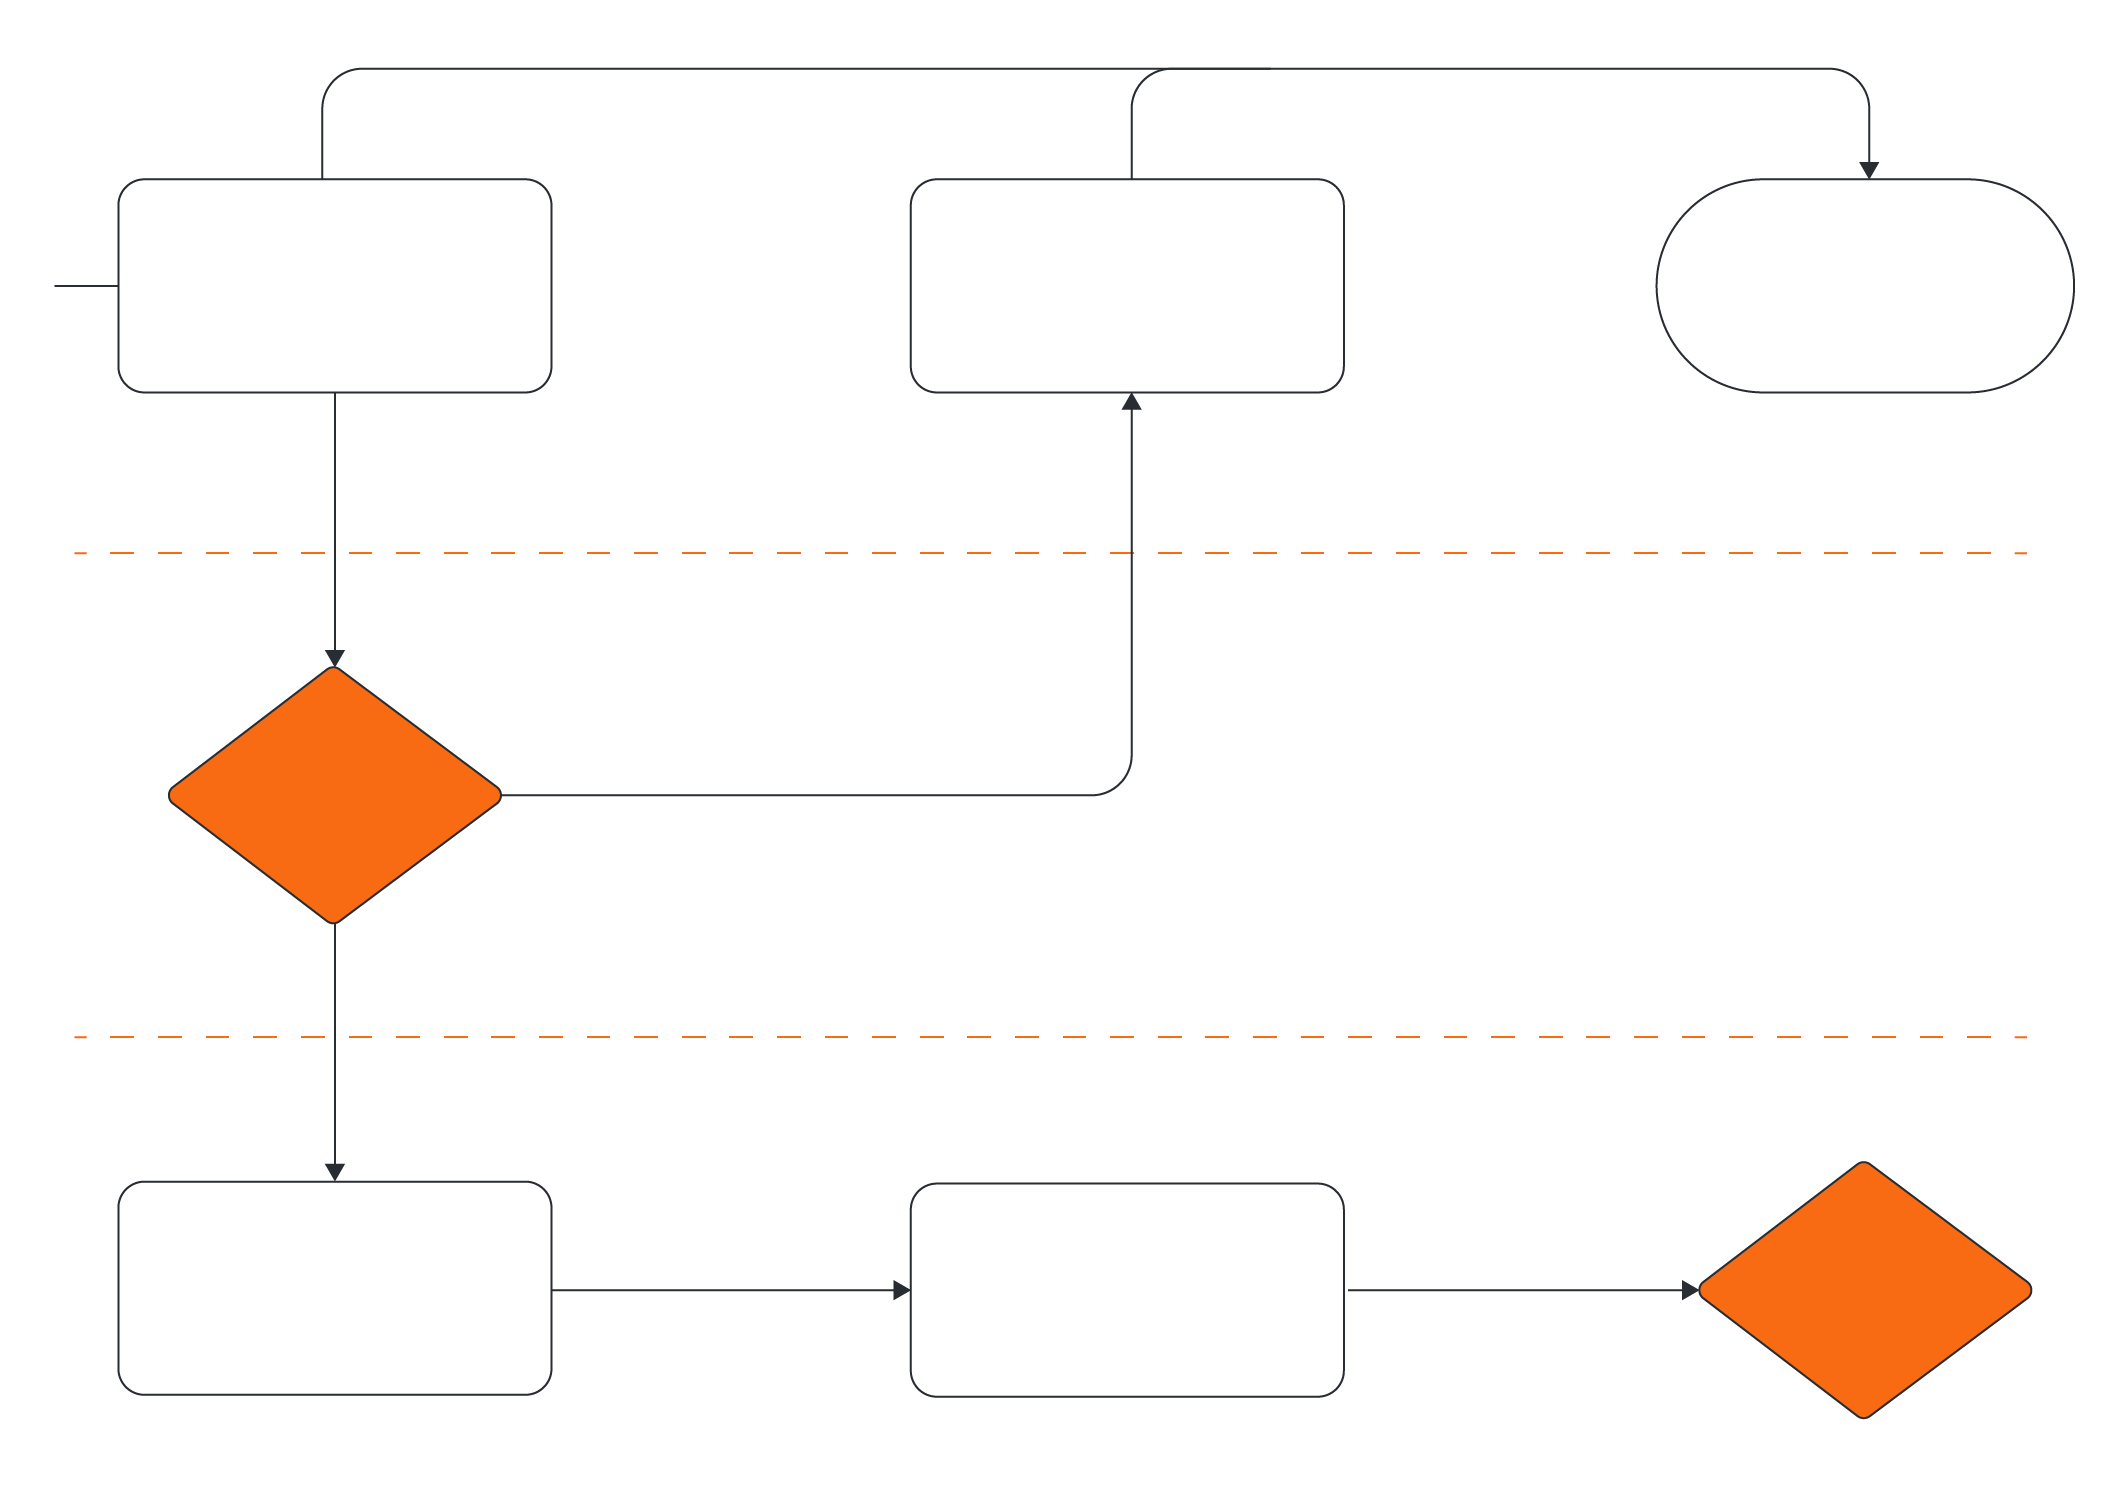 конструктор схем онлайн